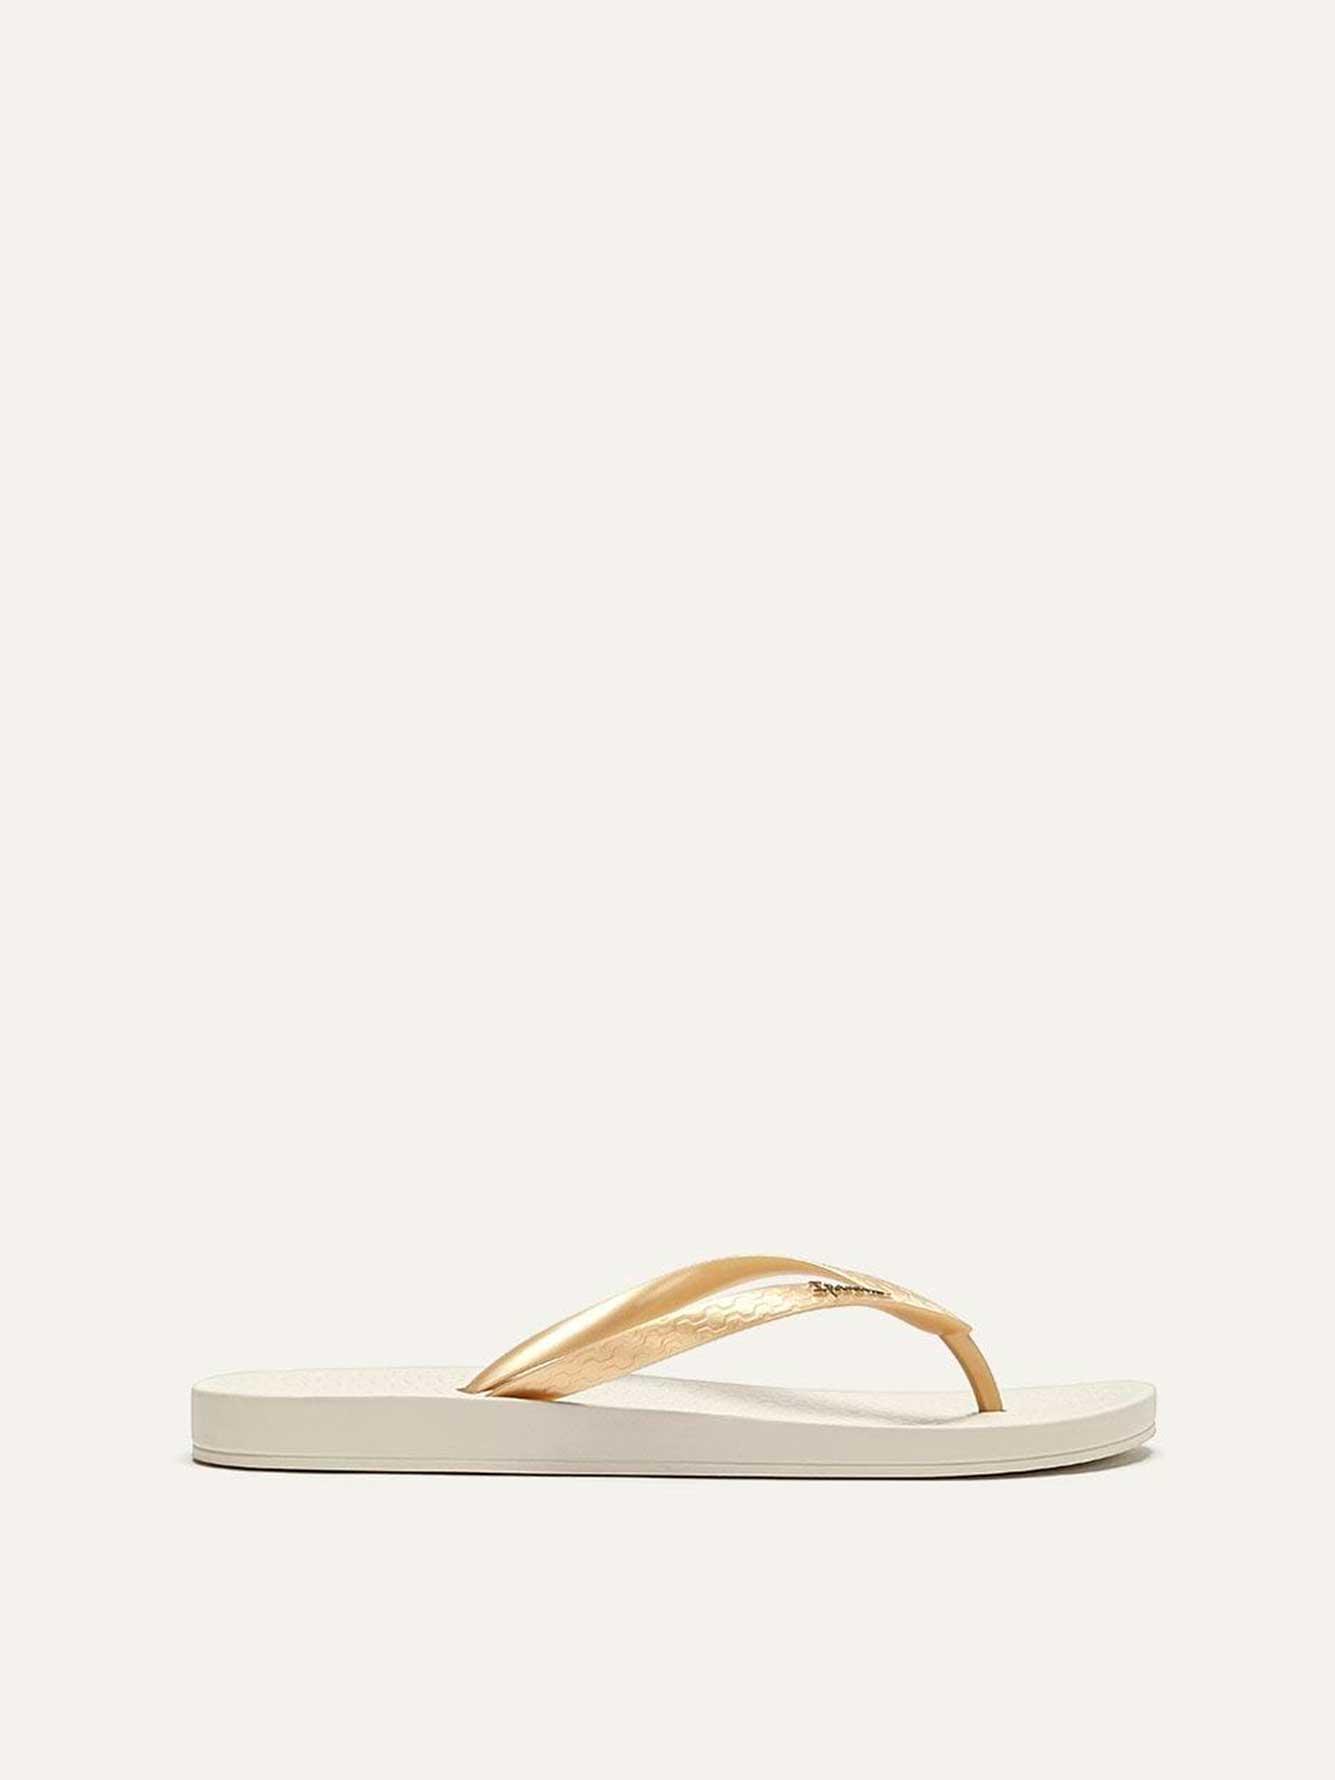 Wide Flop Sandals Ipanema Flop Flip Wide Flip Sandals Ipanema D9IE2YbeHW